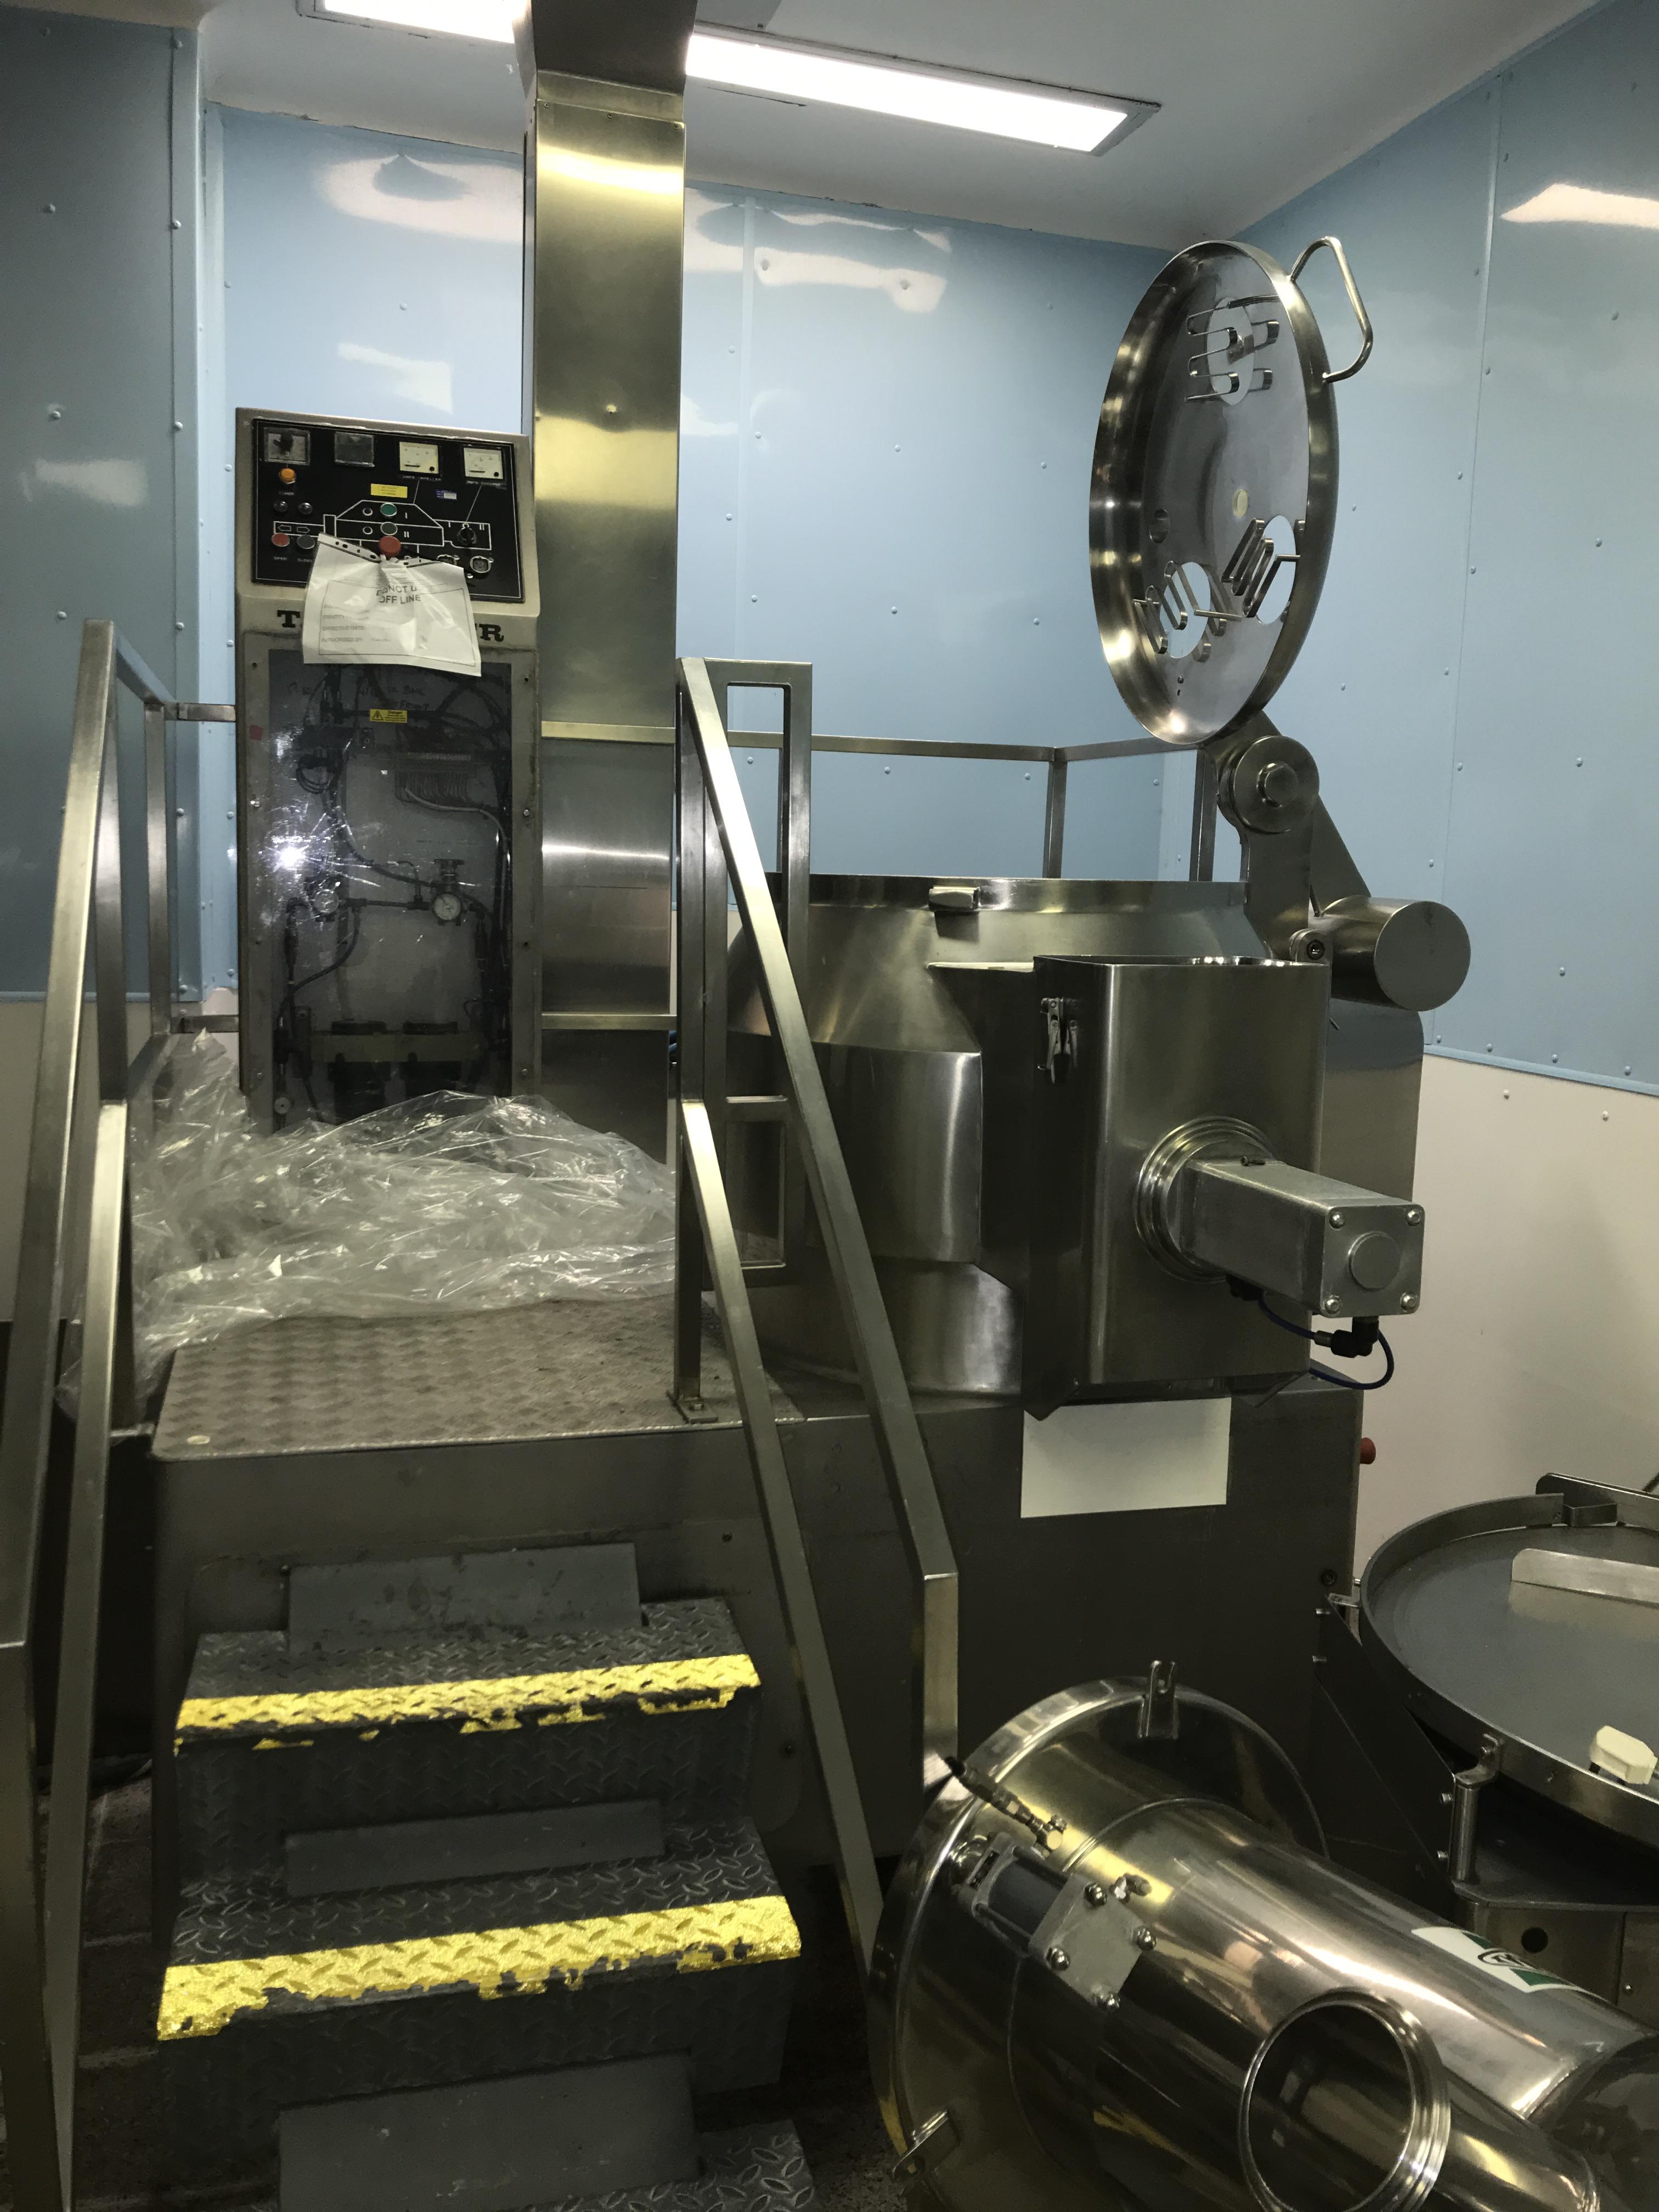 Aeromatic GEA Complete line Aeromatic GEA High Shear Mixer PMA 300 - Fluid bed Dryer T5